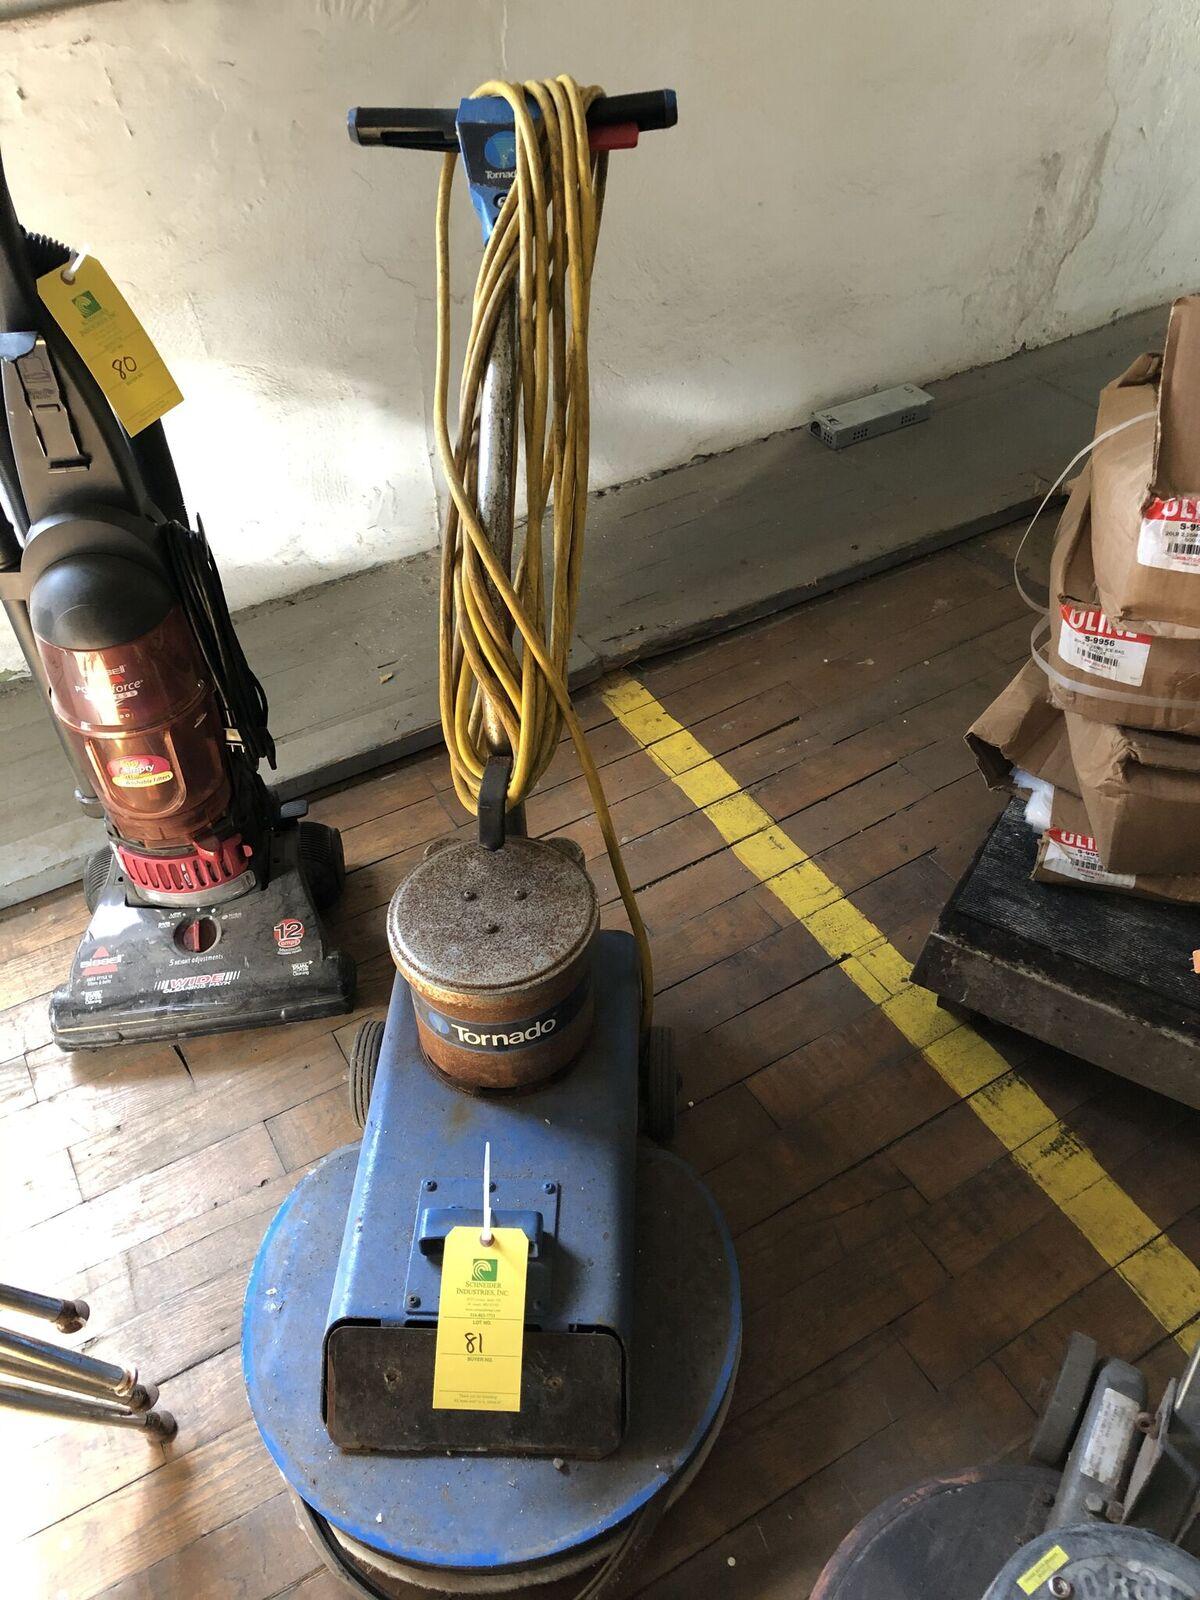 Lot 81 - Tornado Floor Scrubber